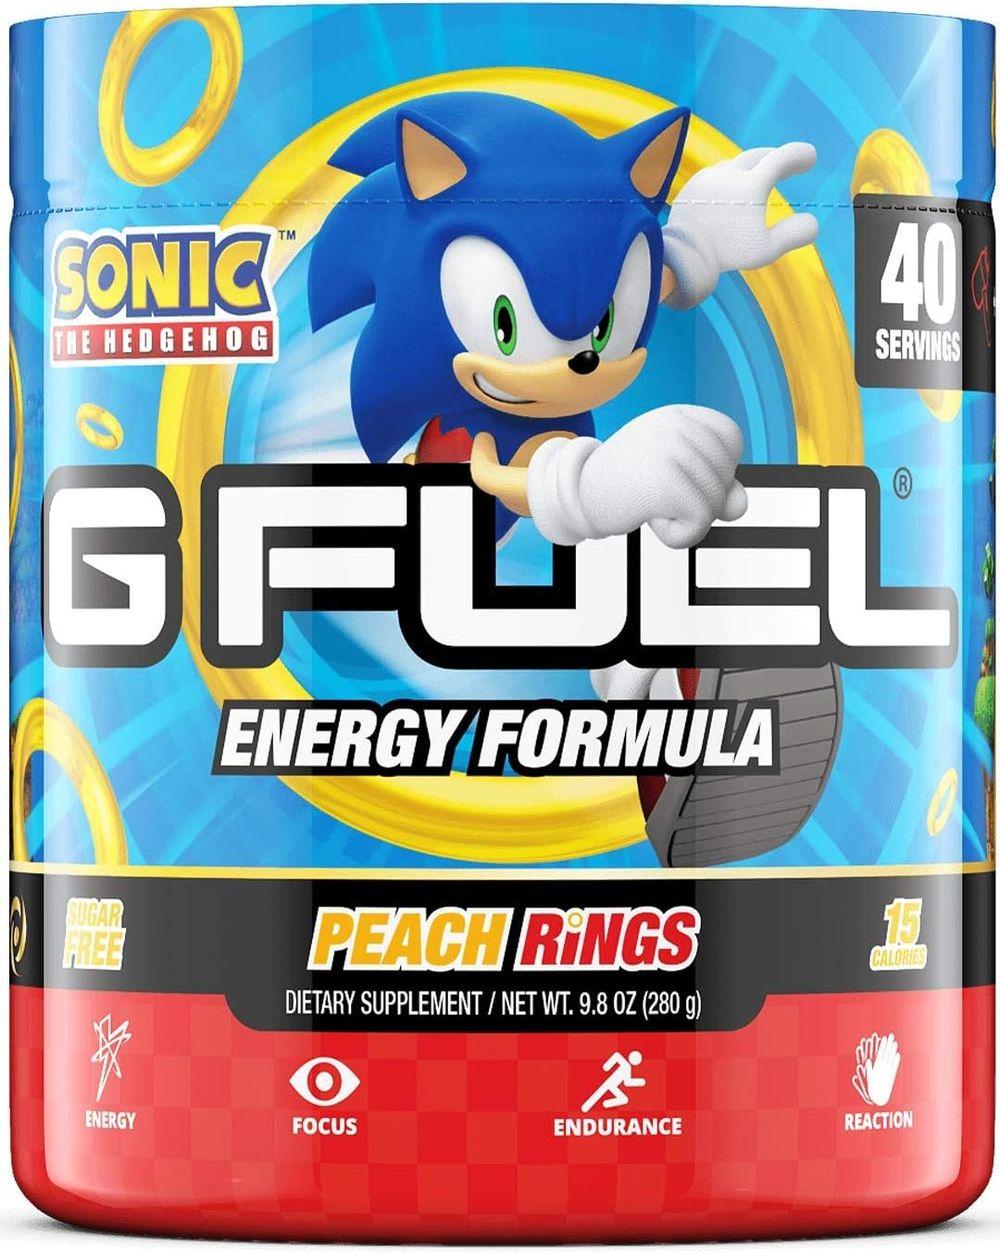 G Fuel Sonic's Peach Rings Elite Energy Powder, 9.8 oz (40 Servings)